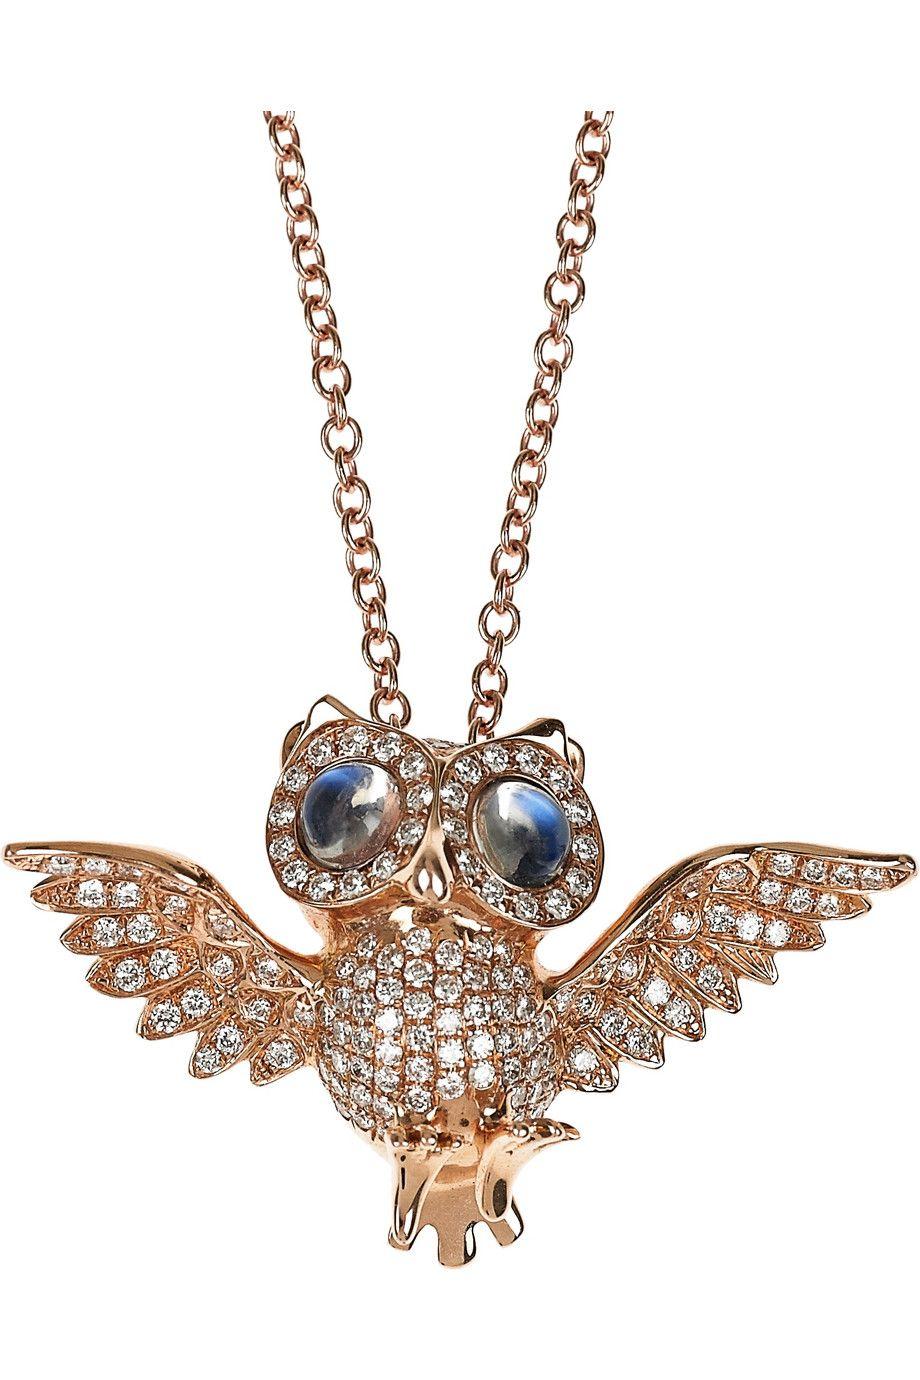 ANITA KO   Owl 18-karat Rose Gold Diamond Necklace 0.6-carat Blue Moonstones and 0.8-carat Diamond embellishment add an eye-catching finish to Anita Ko's 18-karat Rose Gold Owl Pendant Necklace. Wear it to stamp everyday looks with an irreverent touch. 5,615.00 USD